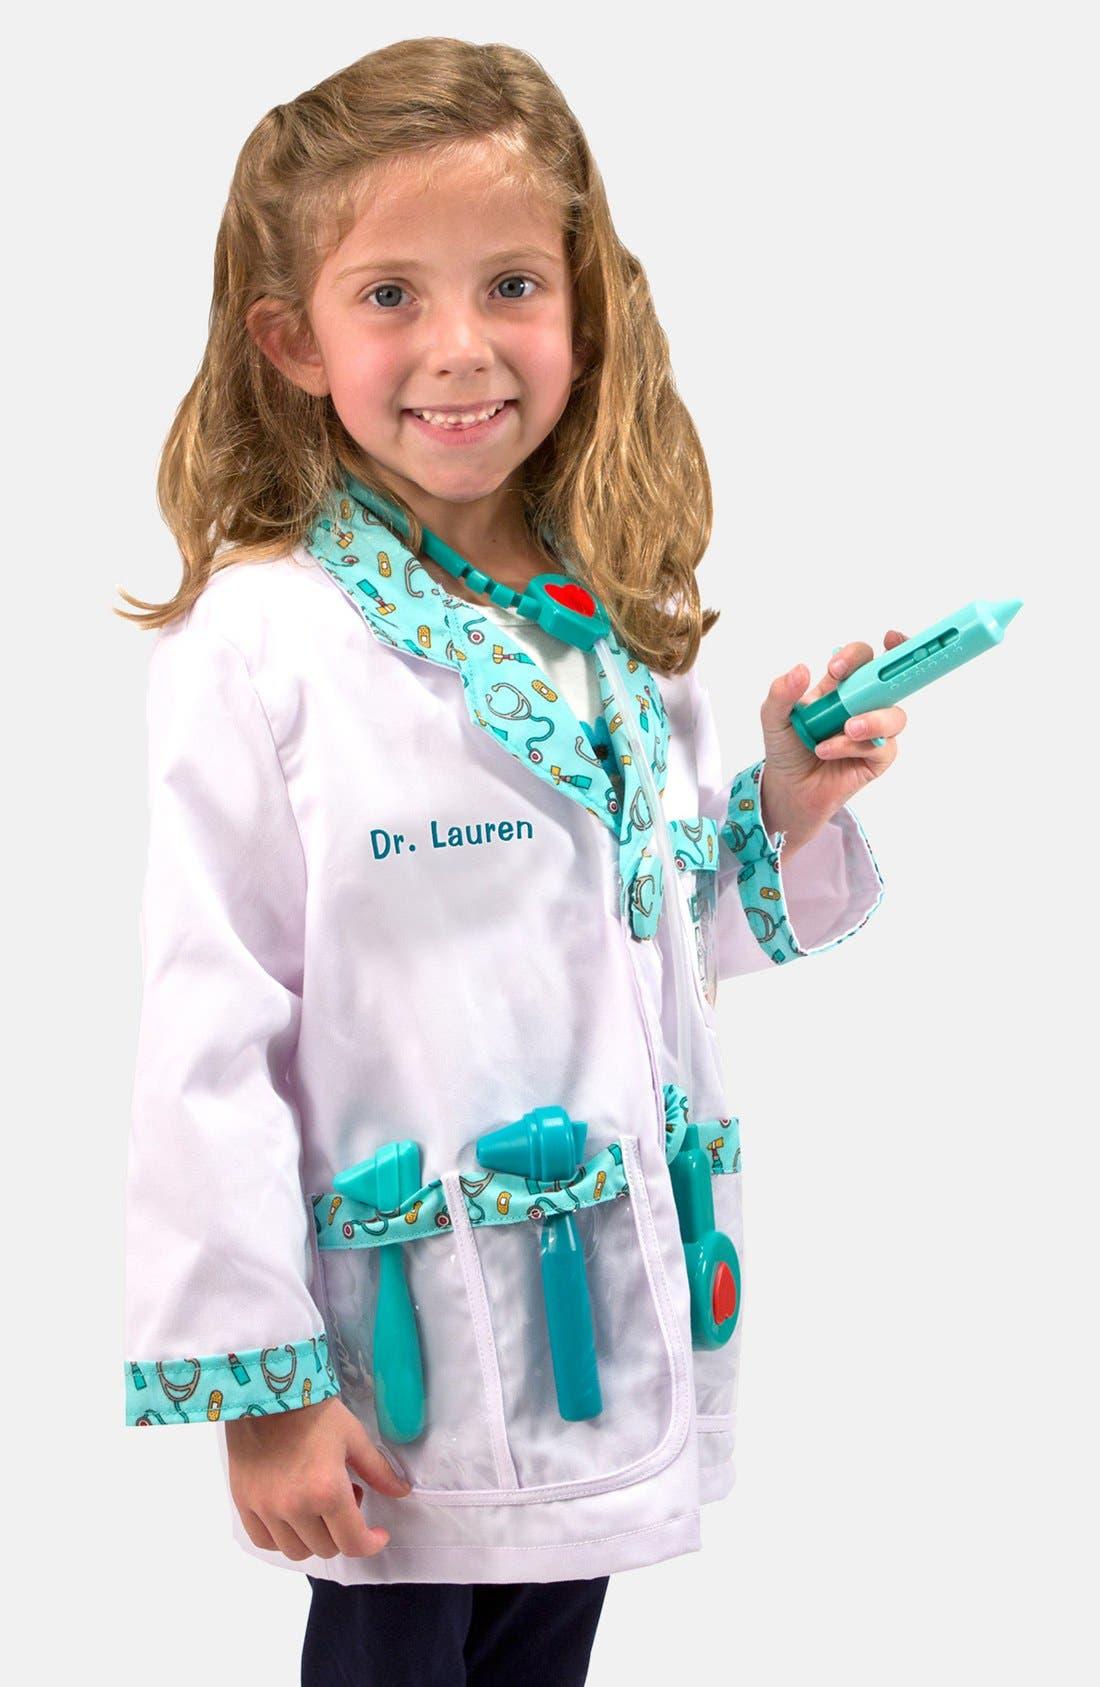 Melissa & Doug 'Doctor' Personalized Costume Set (Toddler)